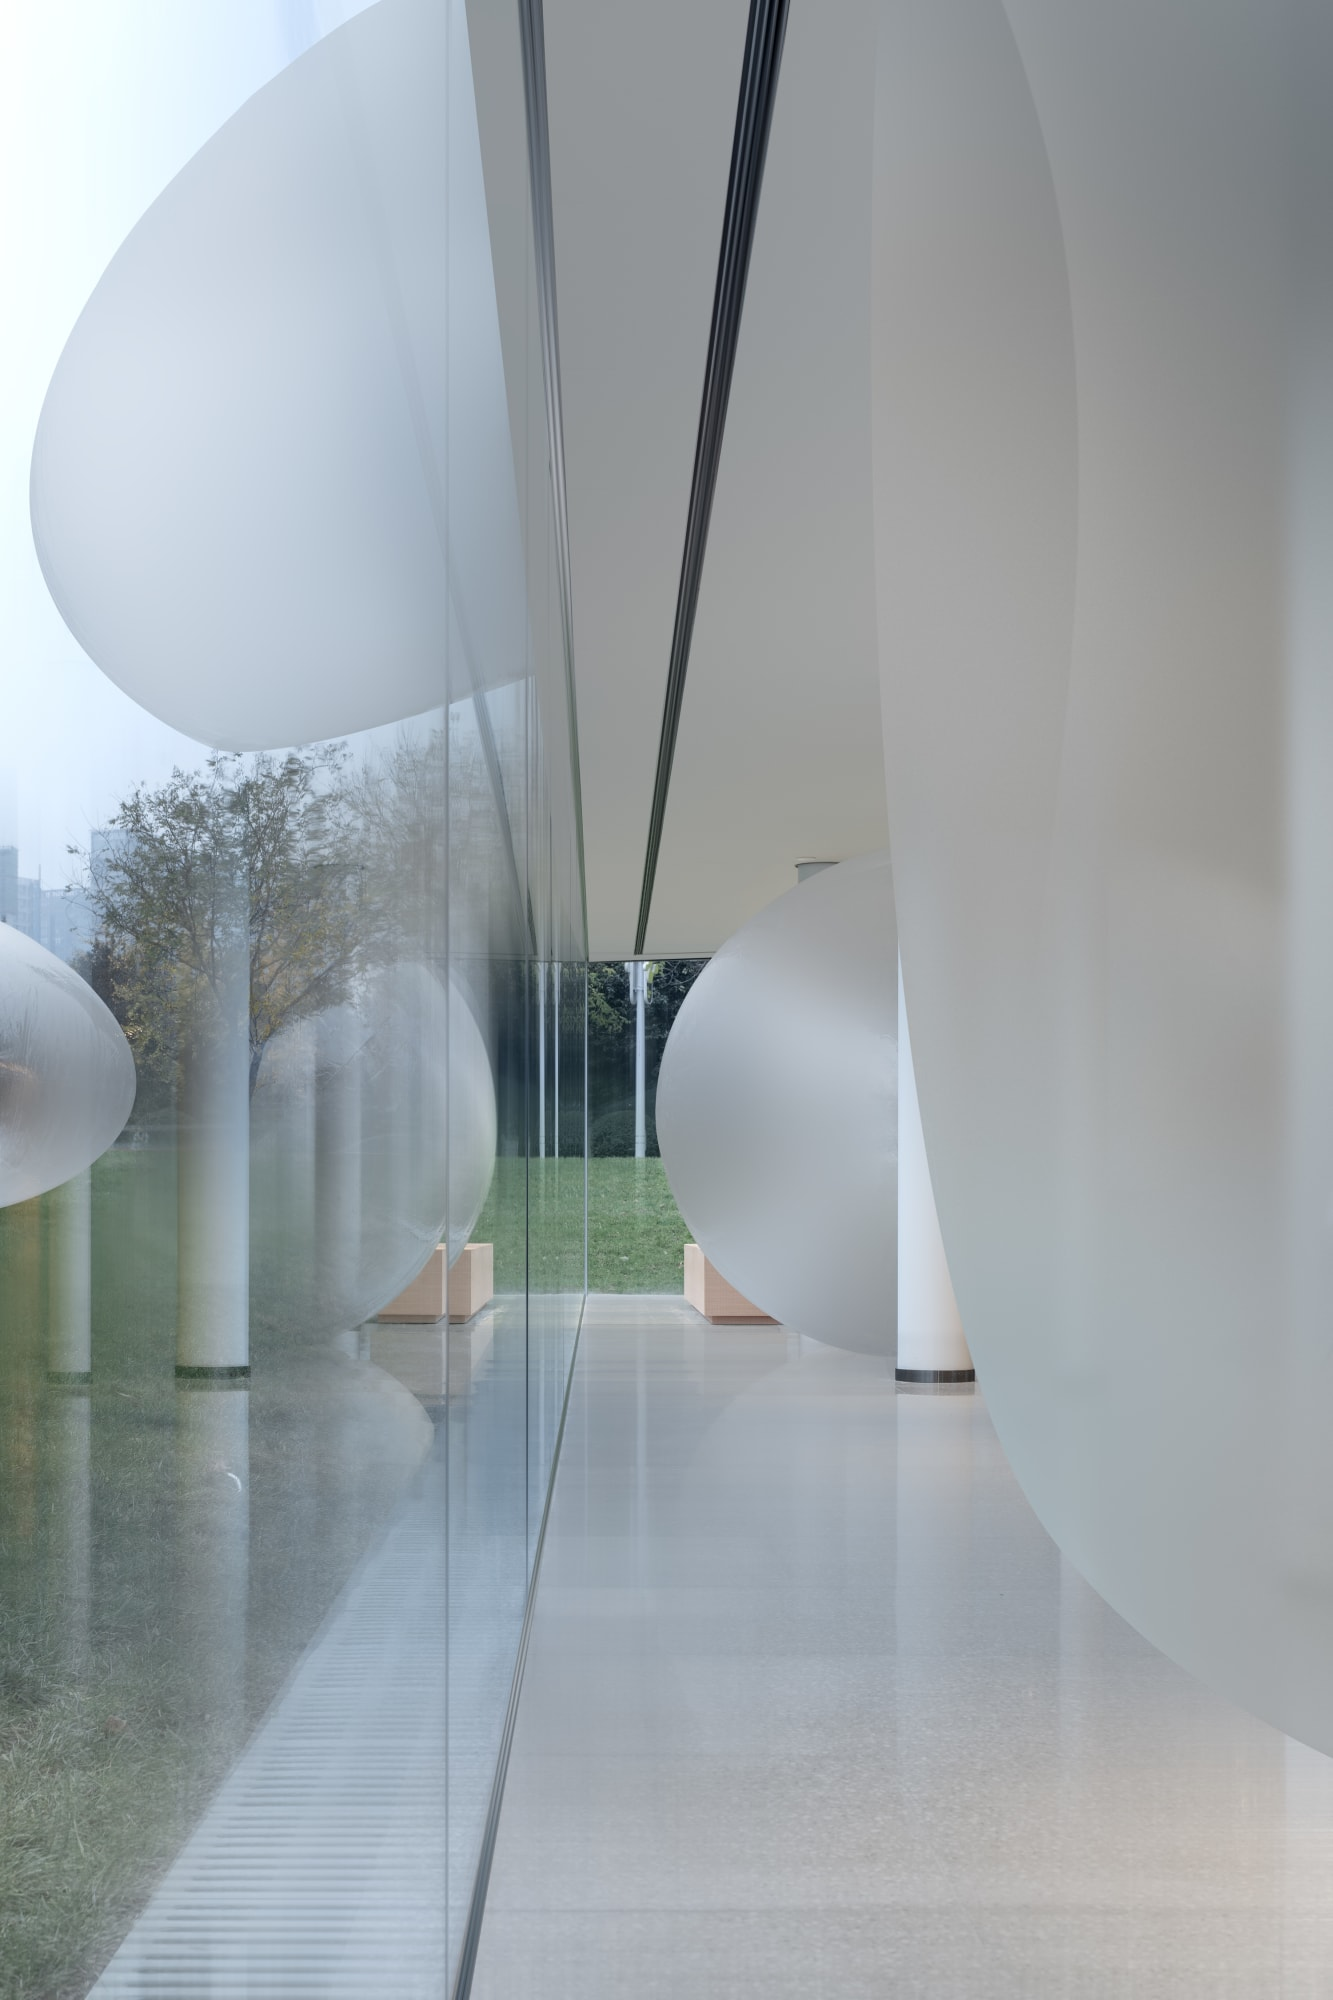 10 Sangu Design, Xiao Tan · [Cheng Dong. A Coherent City] No. 10 ...